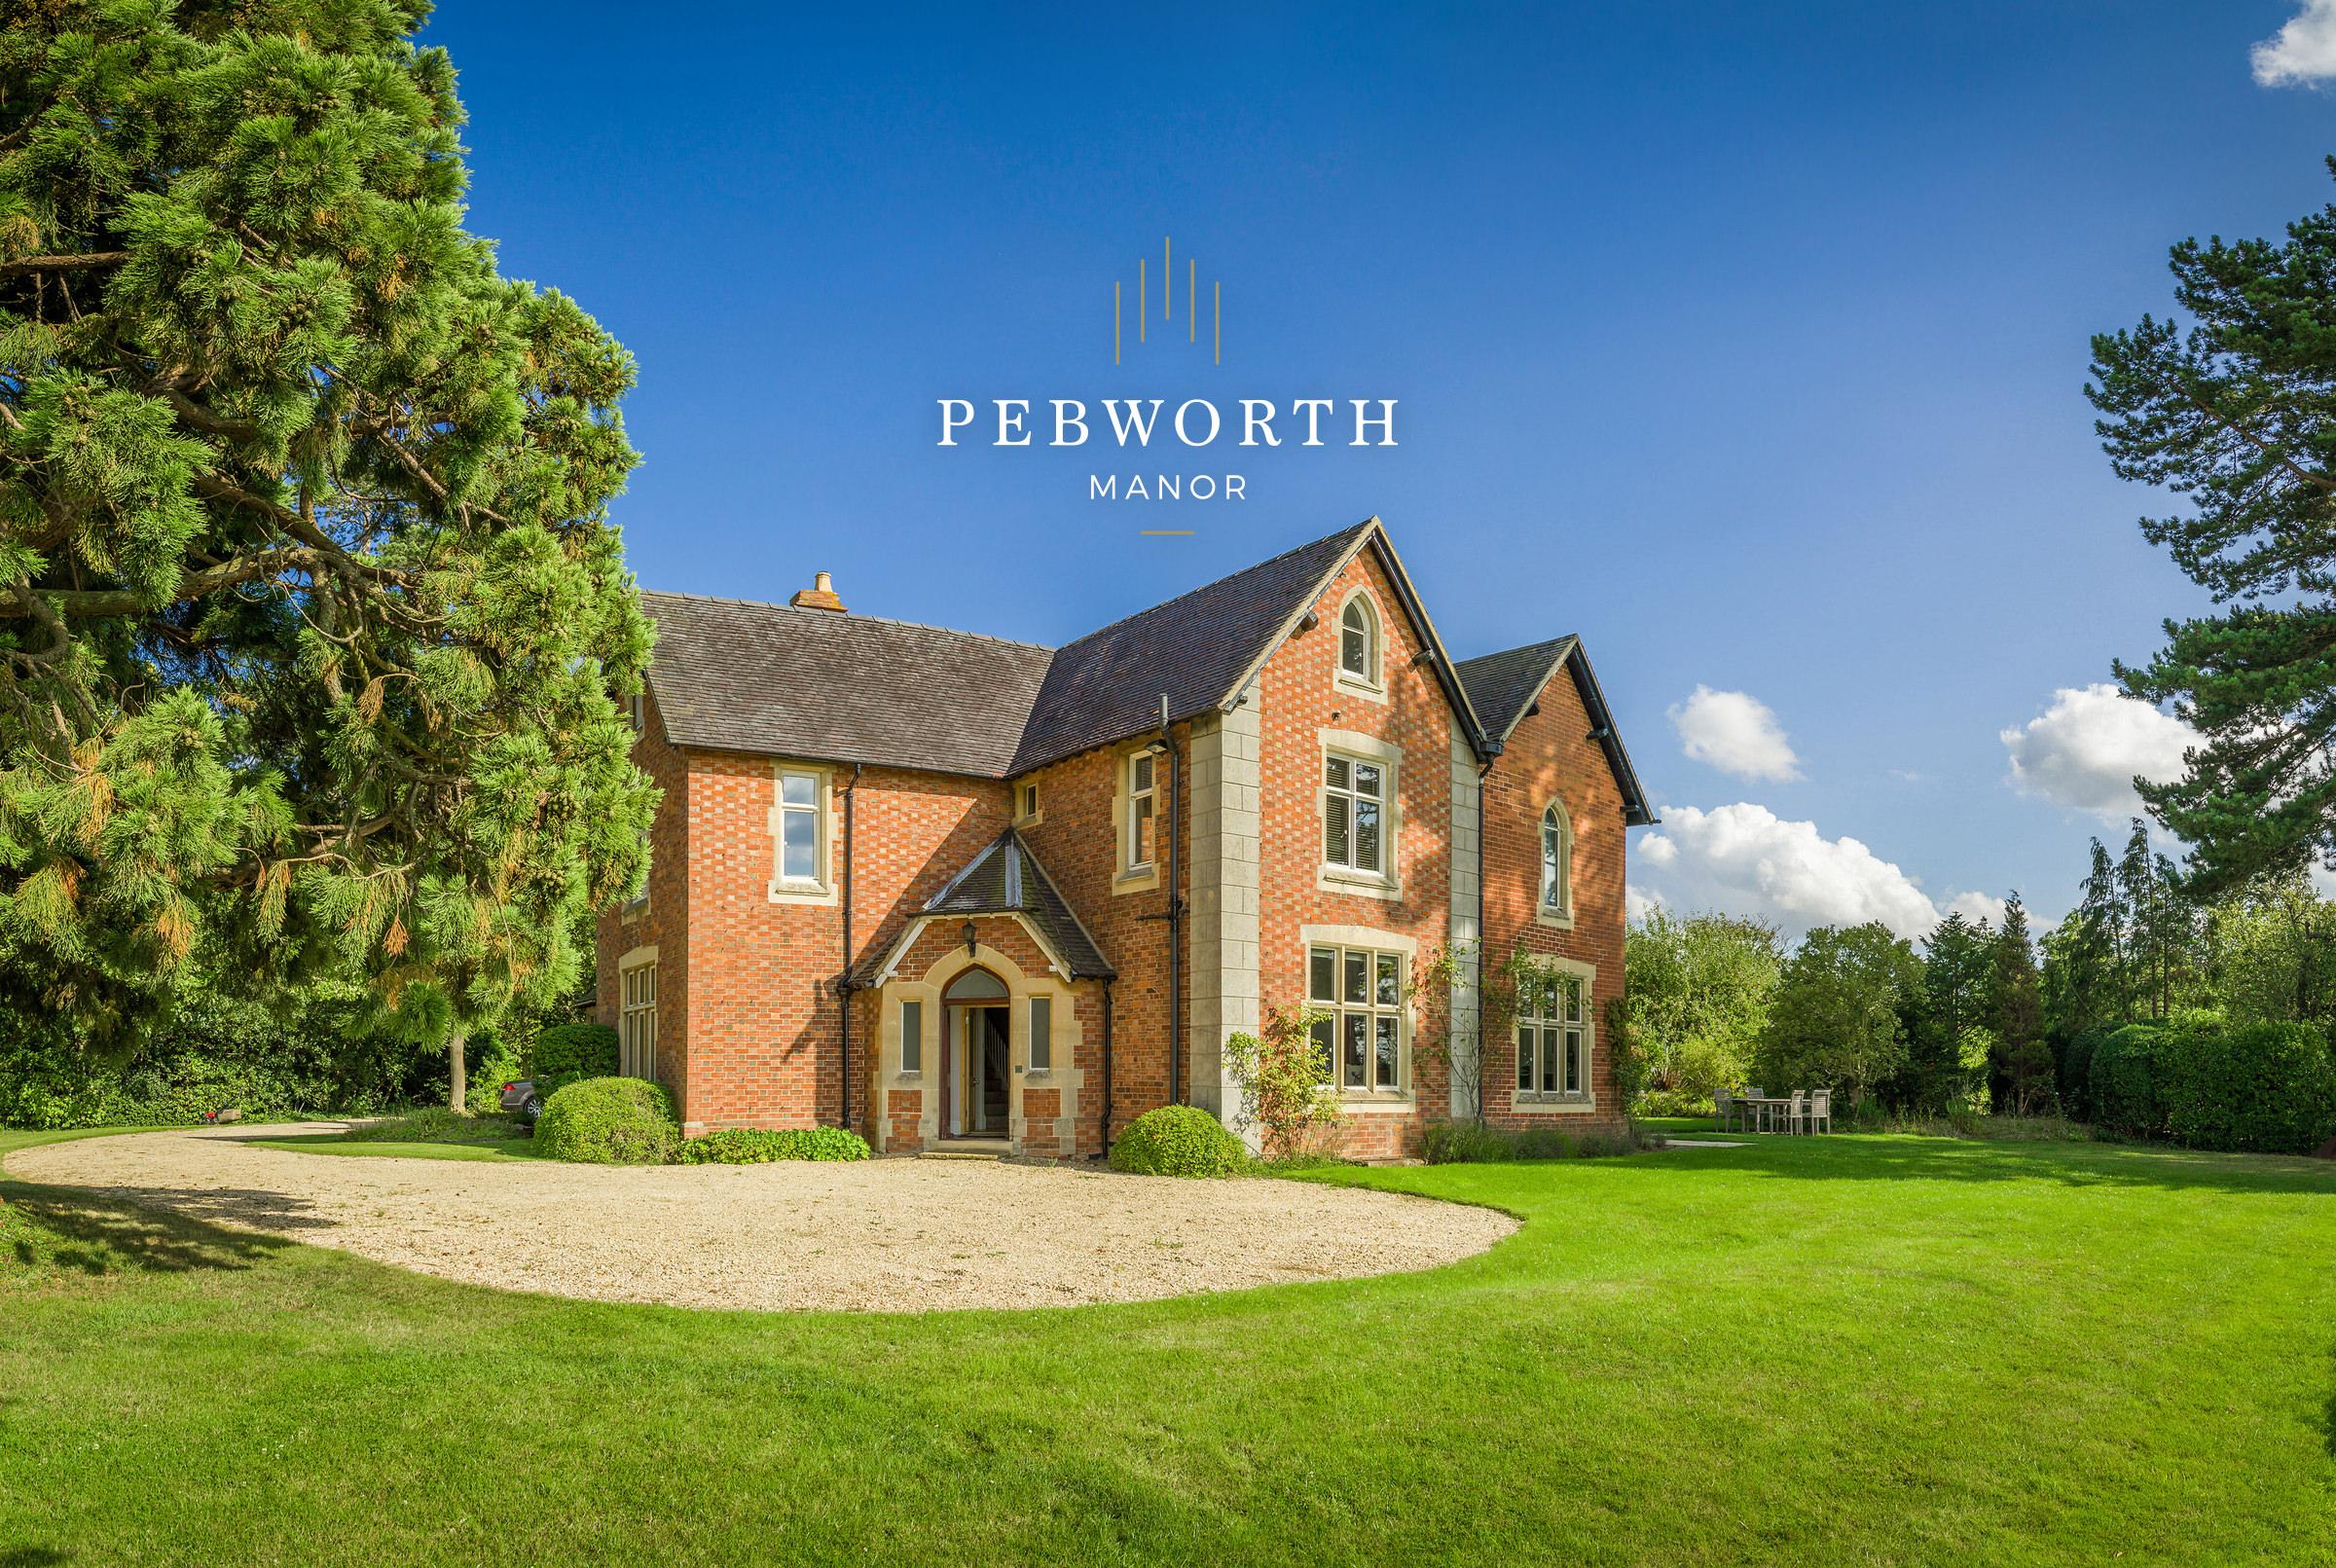 Pebworth Manor